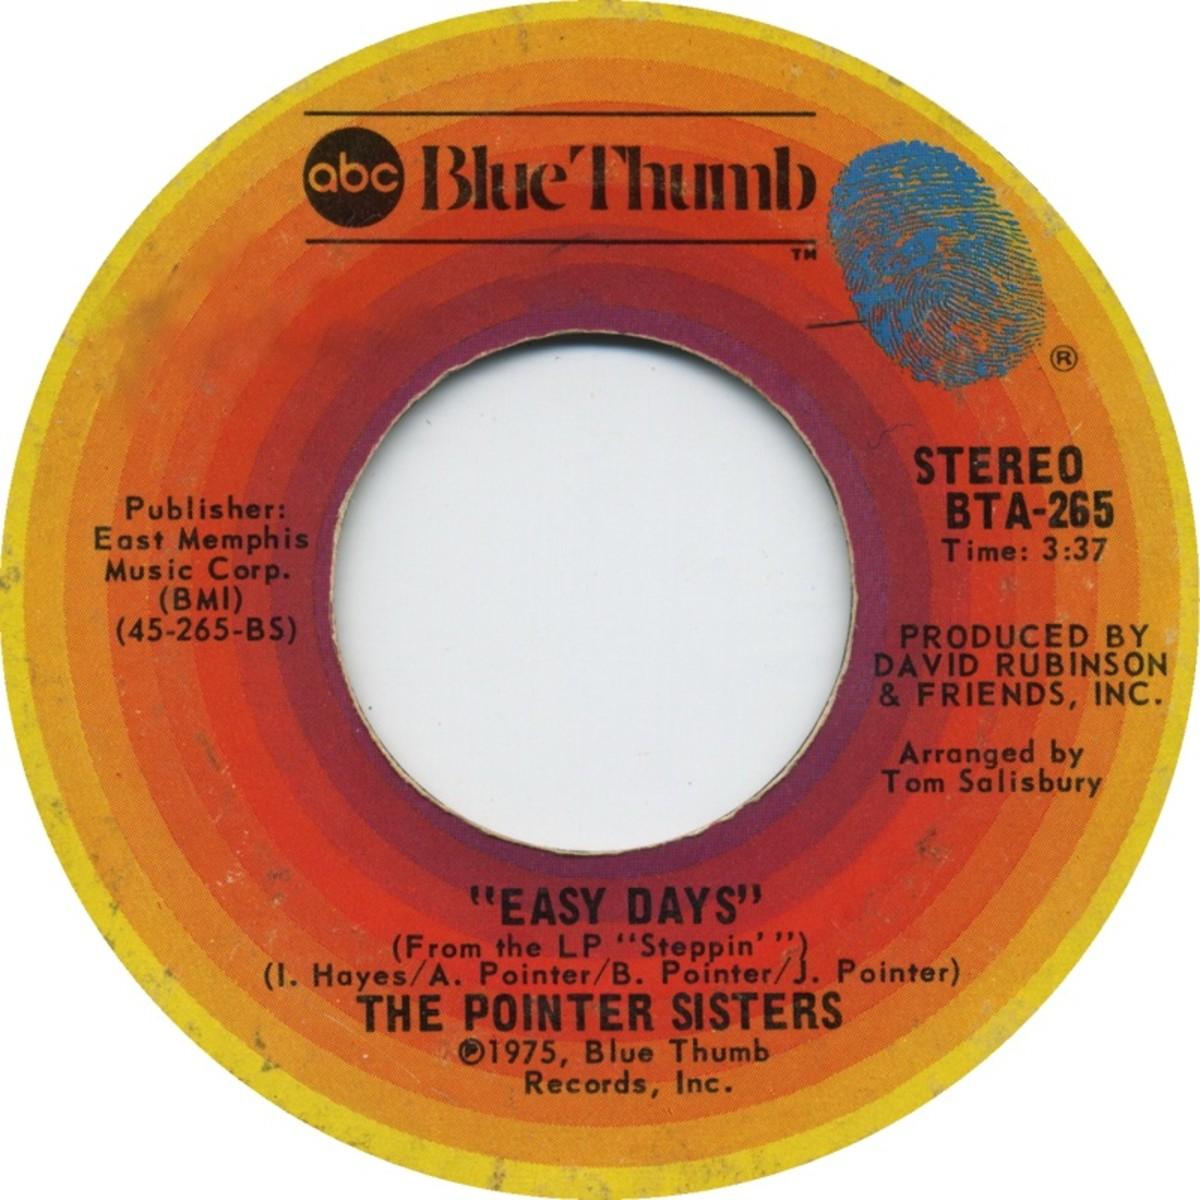 Sampled Track 7 back in 1975